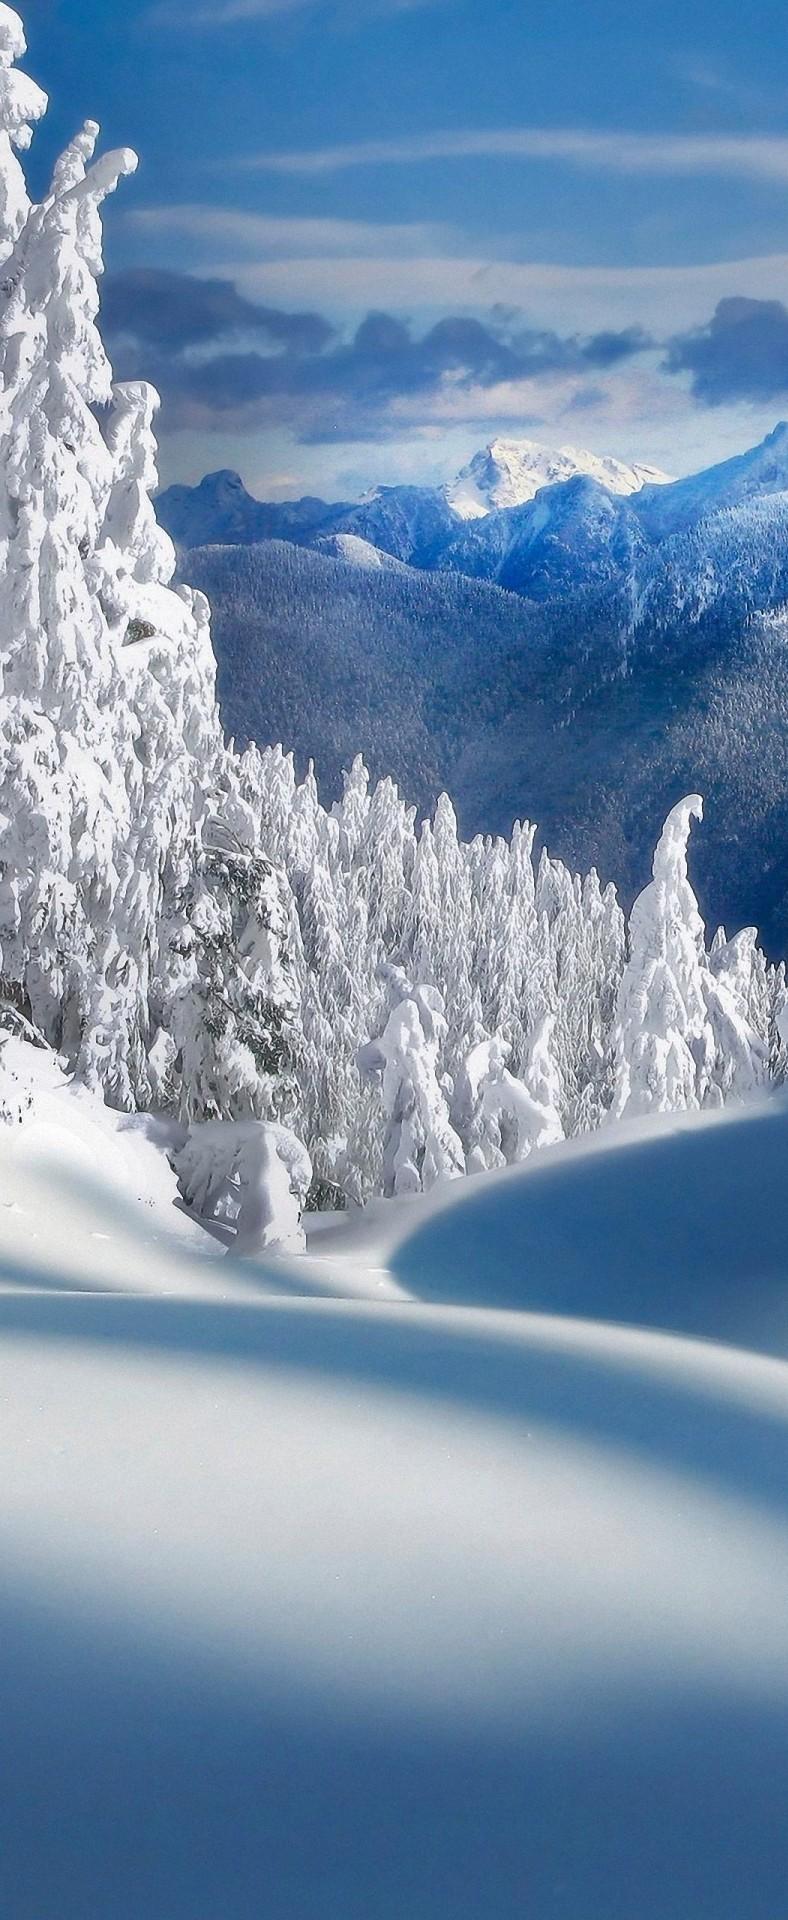 Iphone 8 Plus Wallpaper Winter Snow - HD Wallpaper